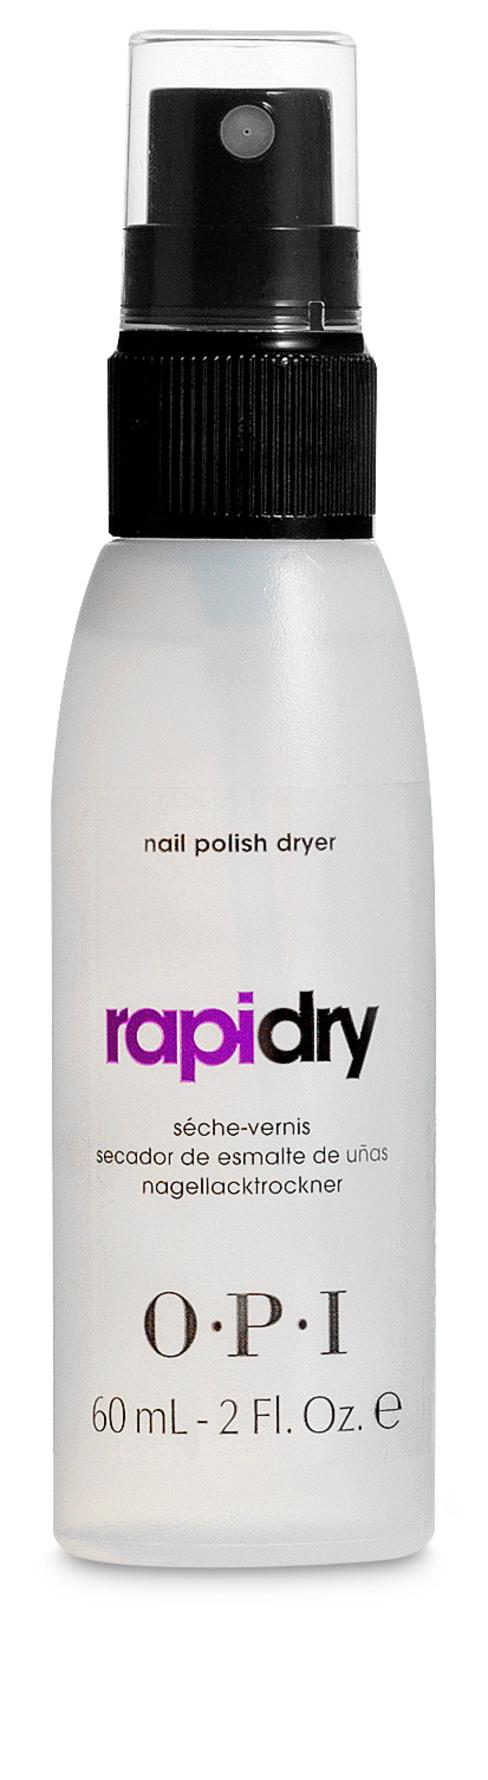 OPI - RapiDry Spray